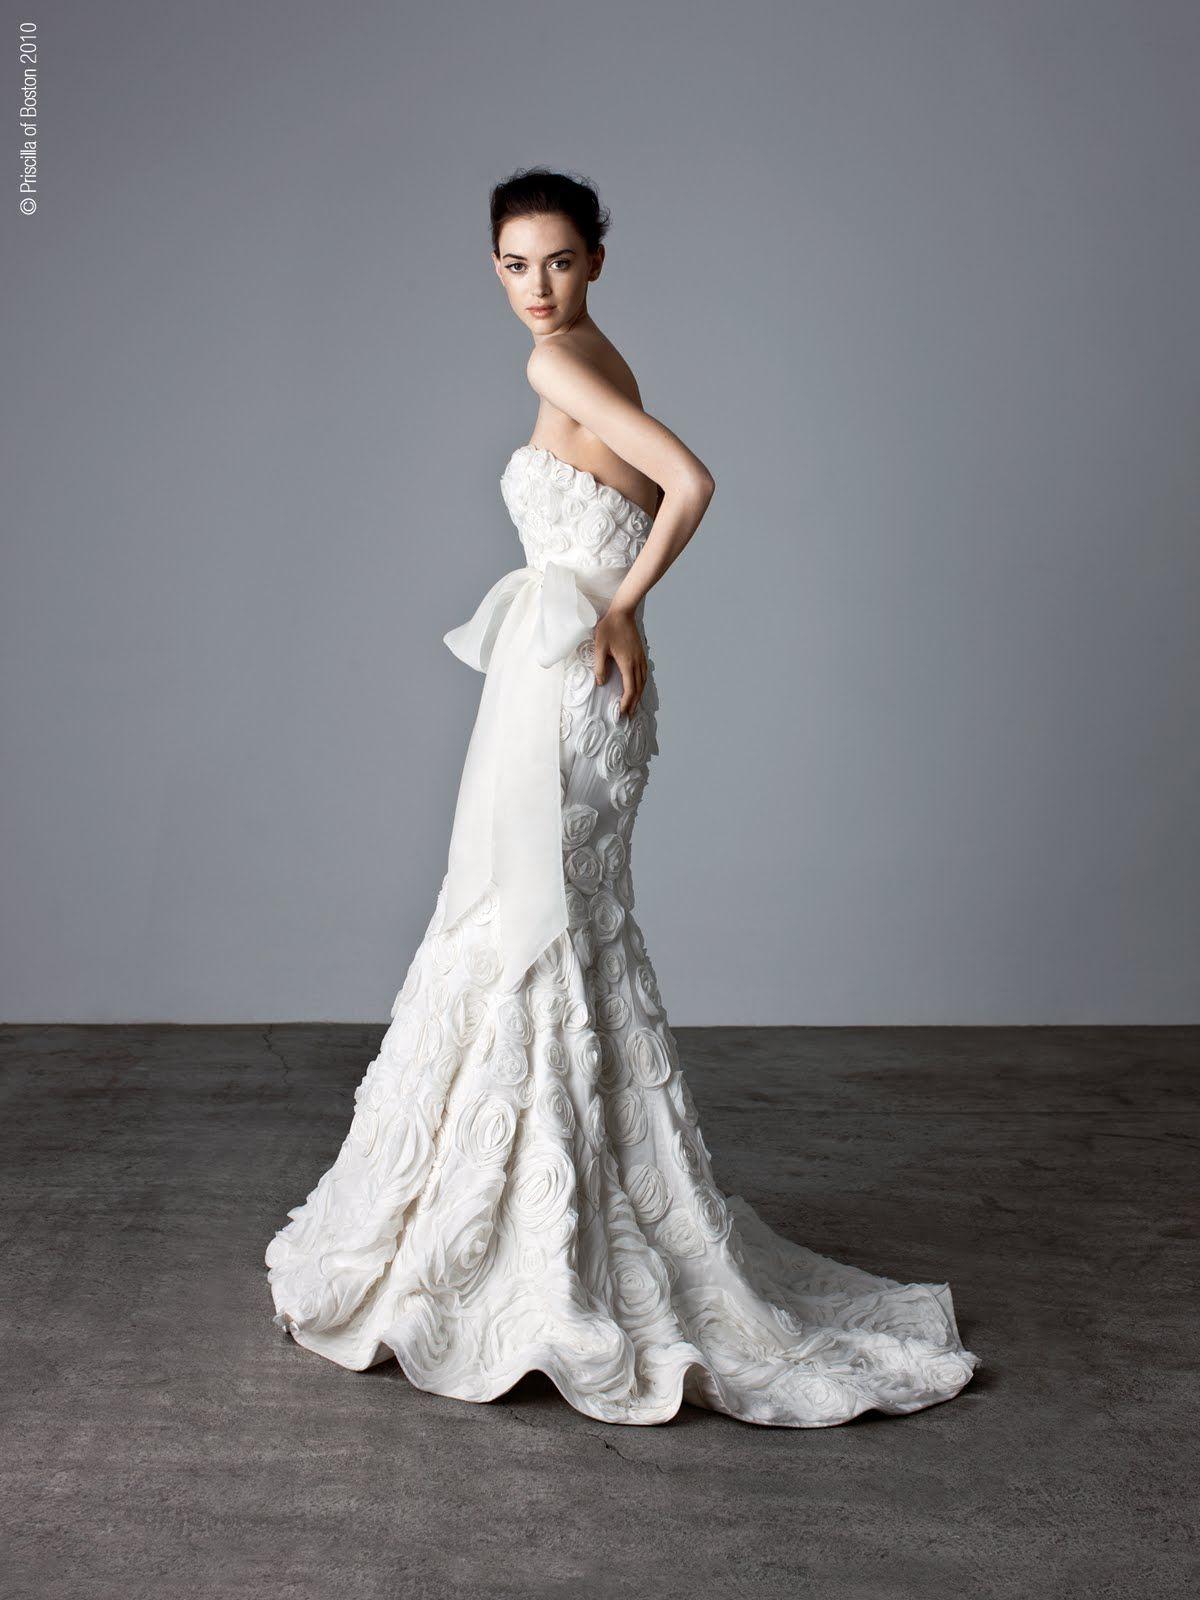 Wallis Melissa Sweet Ceremony Dress Wedding Dresses Rental